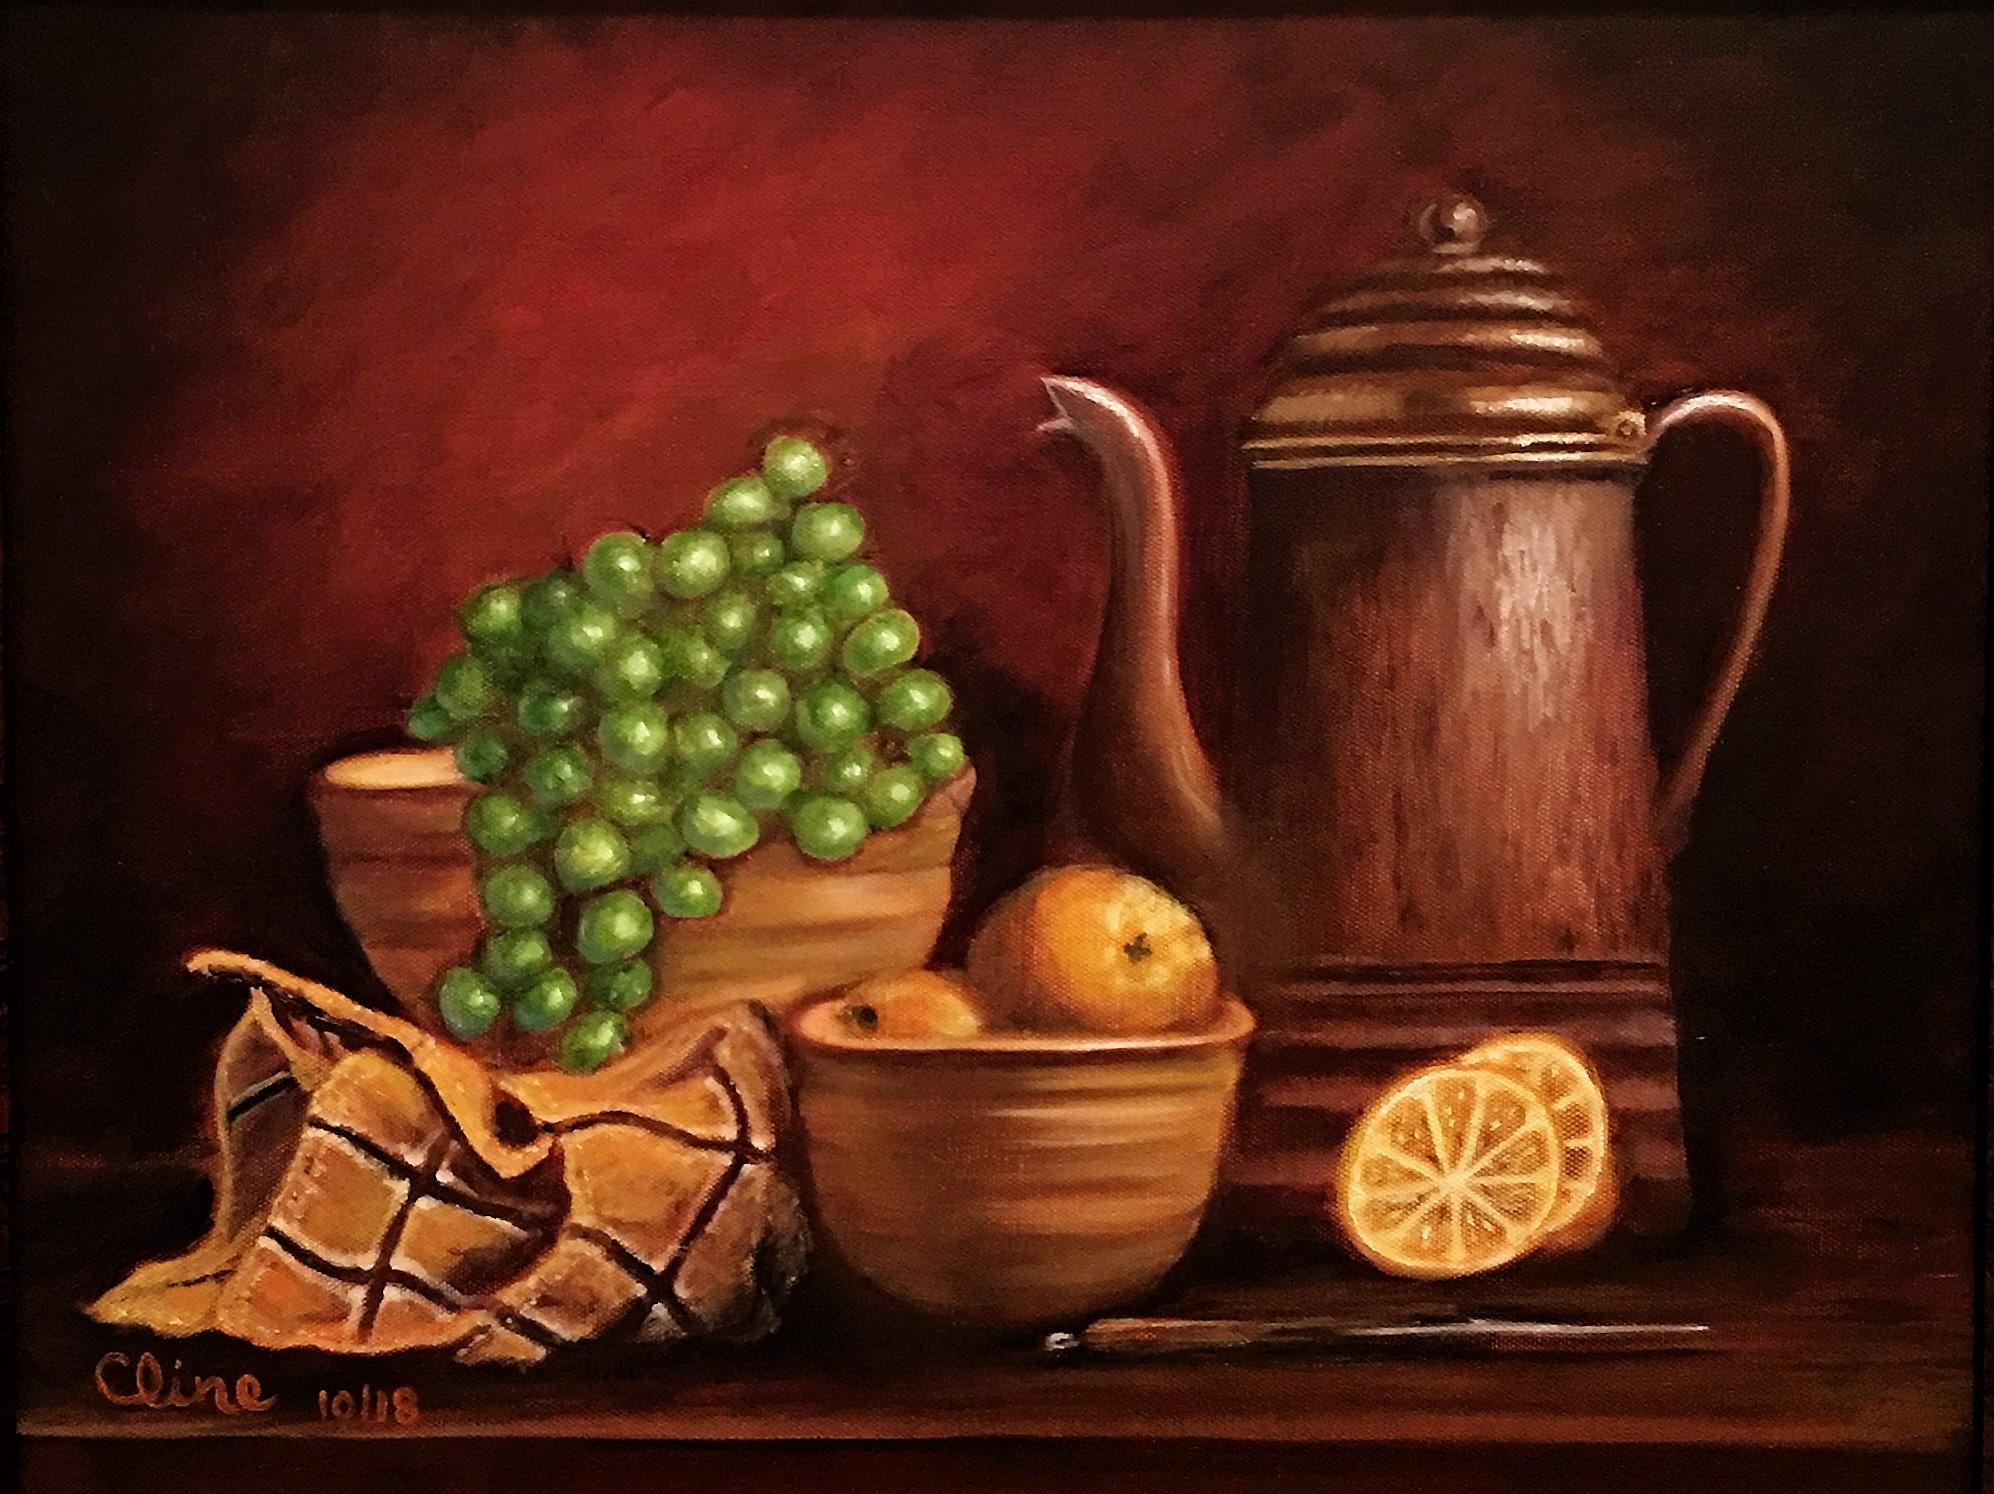 Coffee Pot with Lemons and Tea Towel